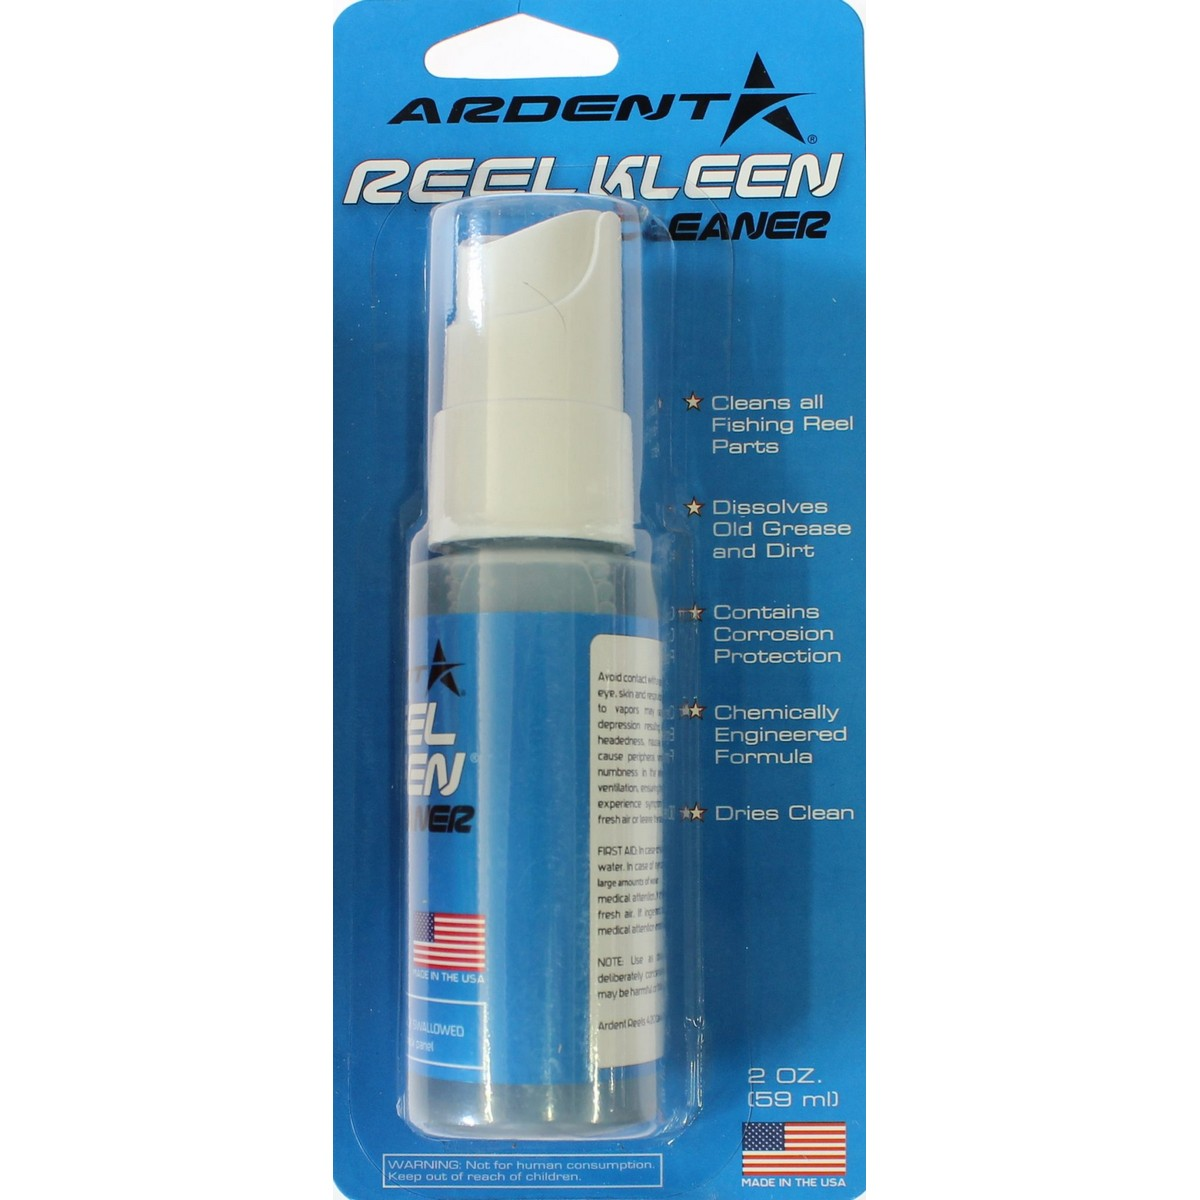 Ardent Reel Kleen Cleaner - смазка за почистване на макари